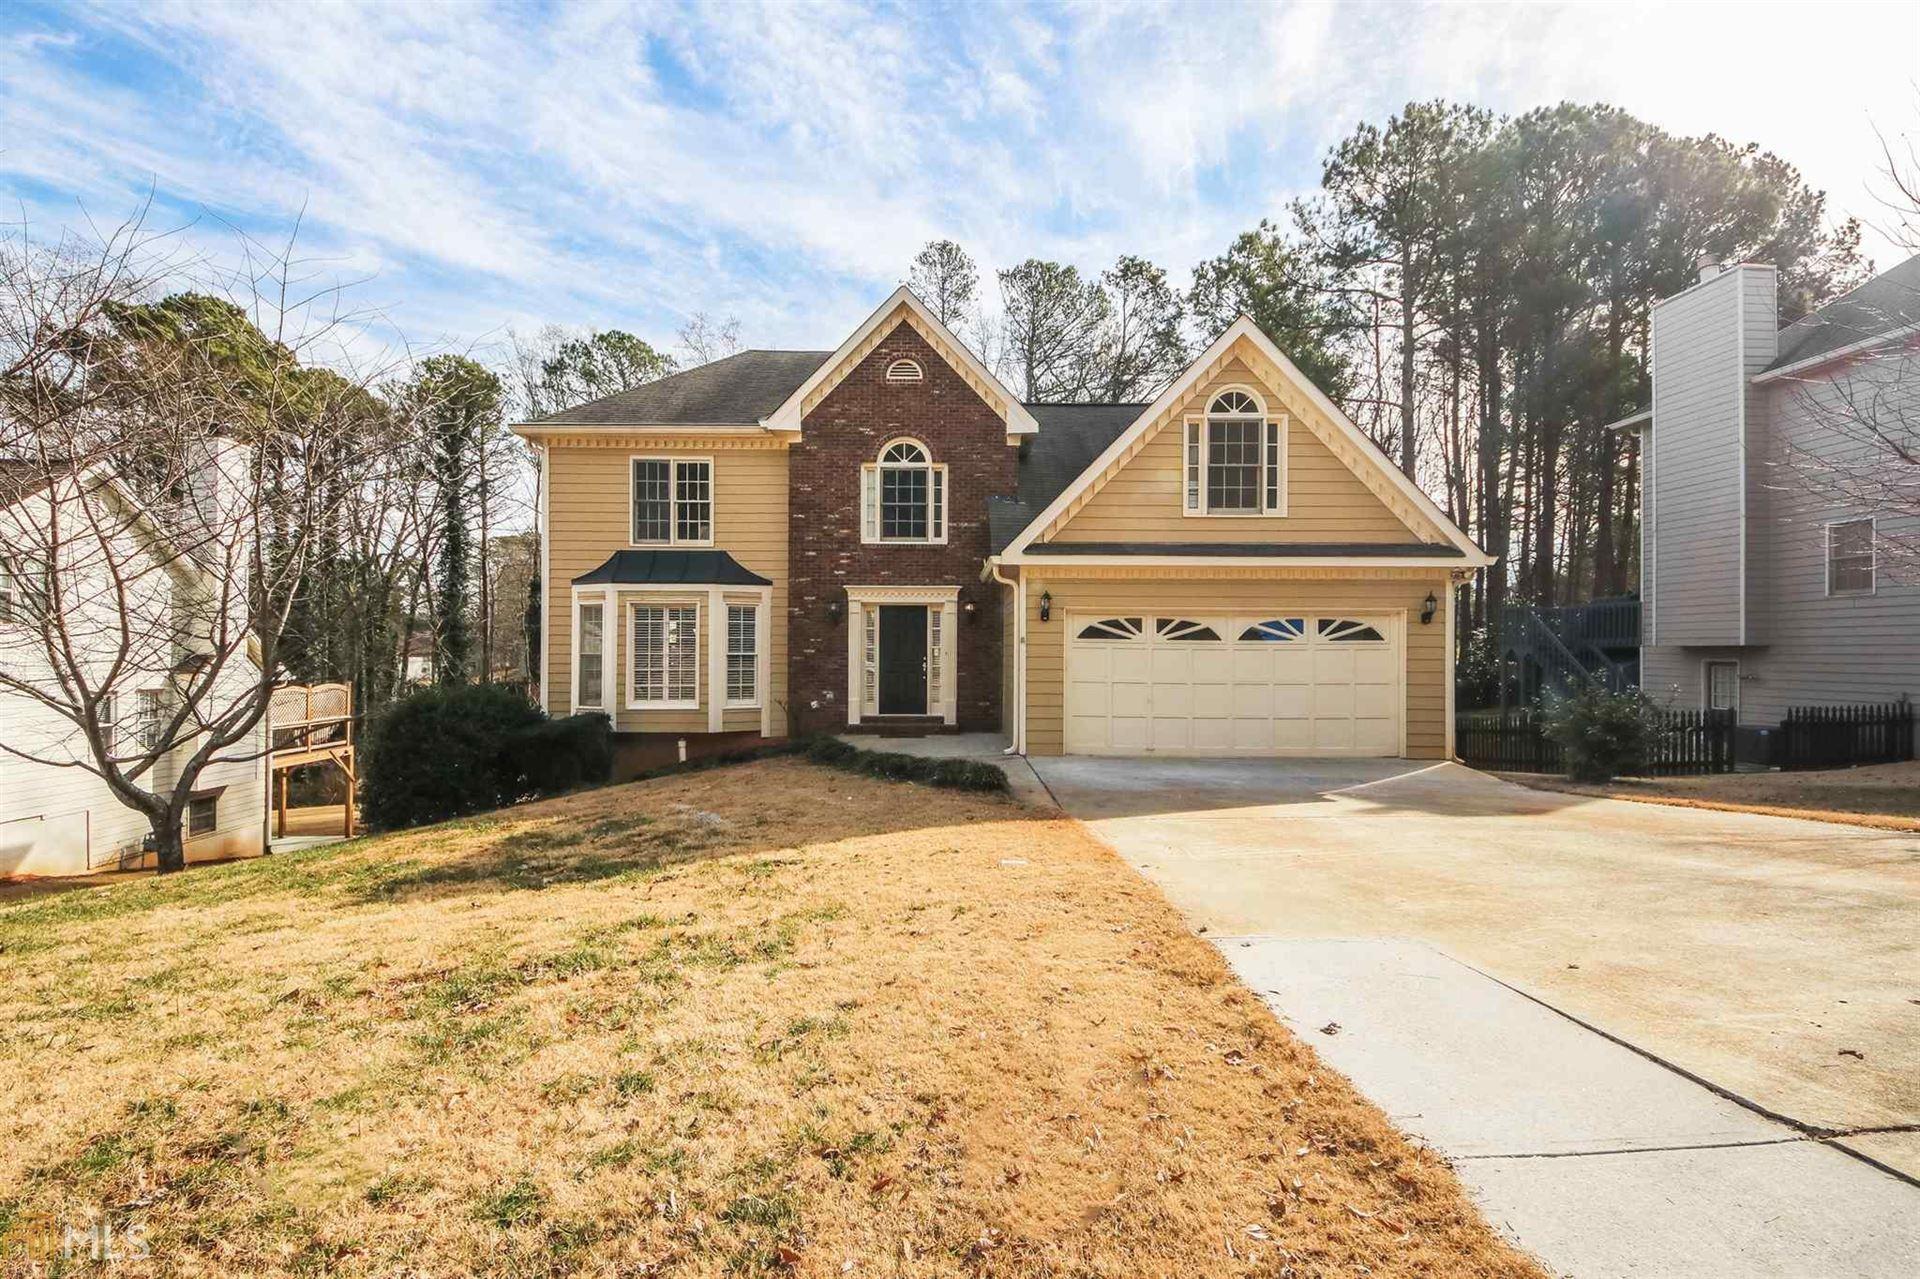 1750 Green Oak Cir, Lawrenceville, GA 30043 - MLS#: 8909081